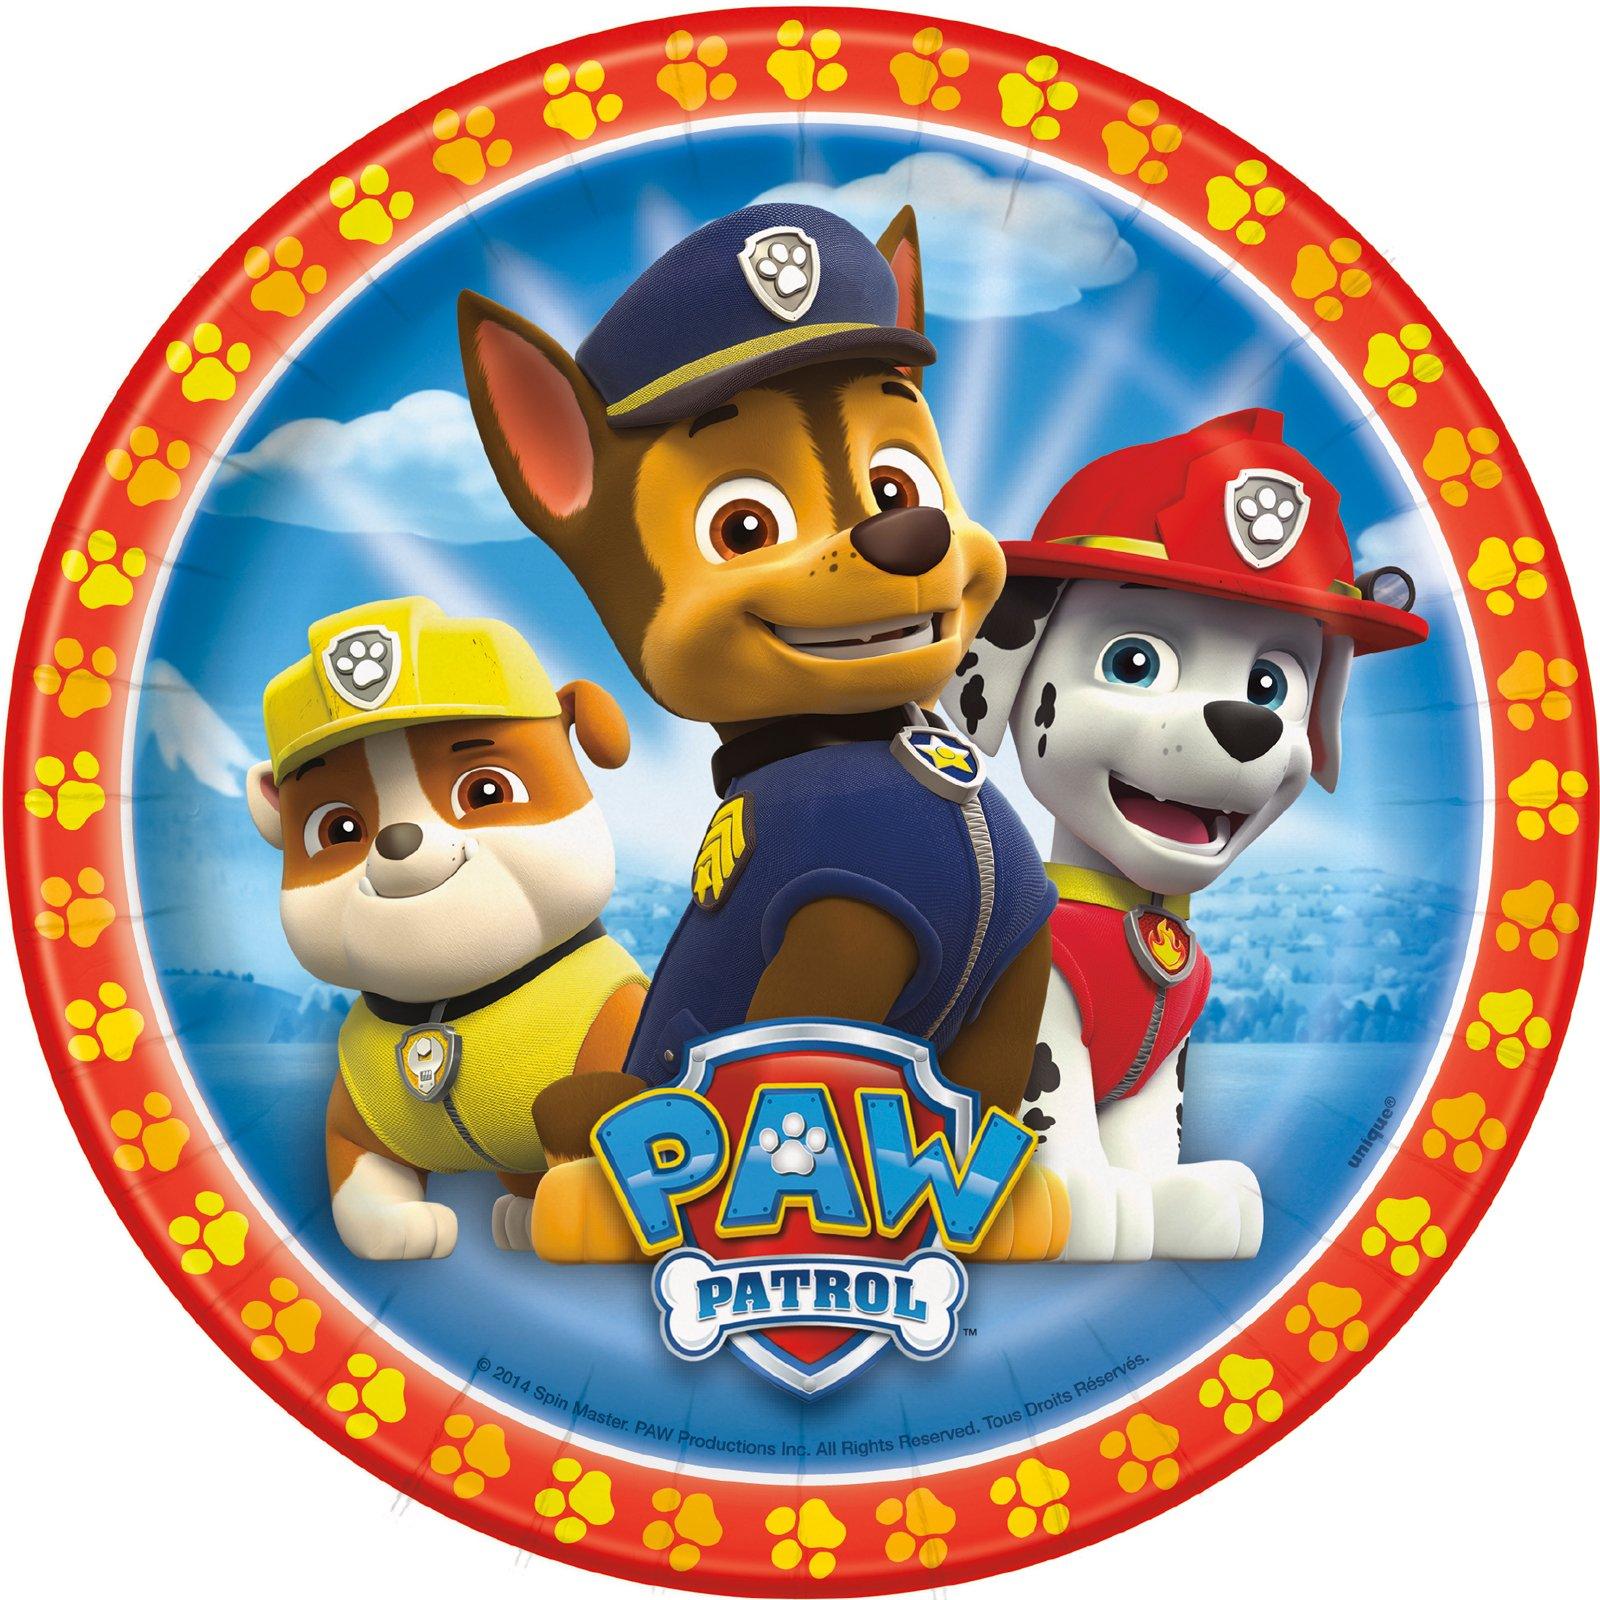 1000+ ideas about Paw Patrol Movie on Pinterest | Paw patrol